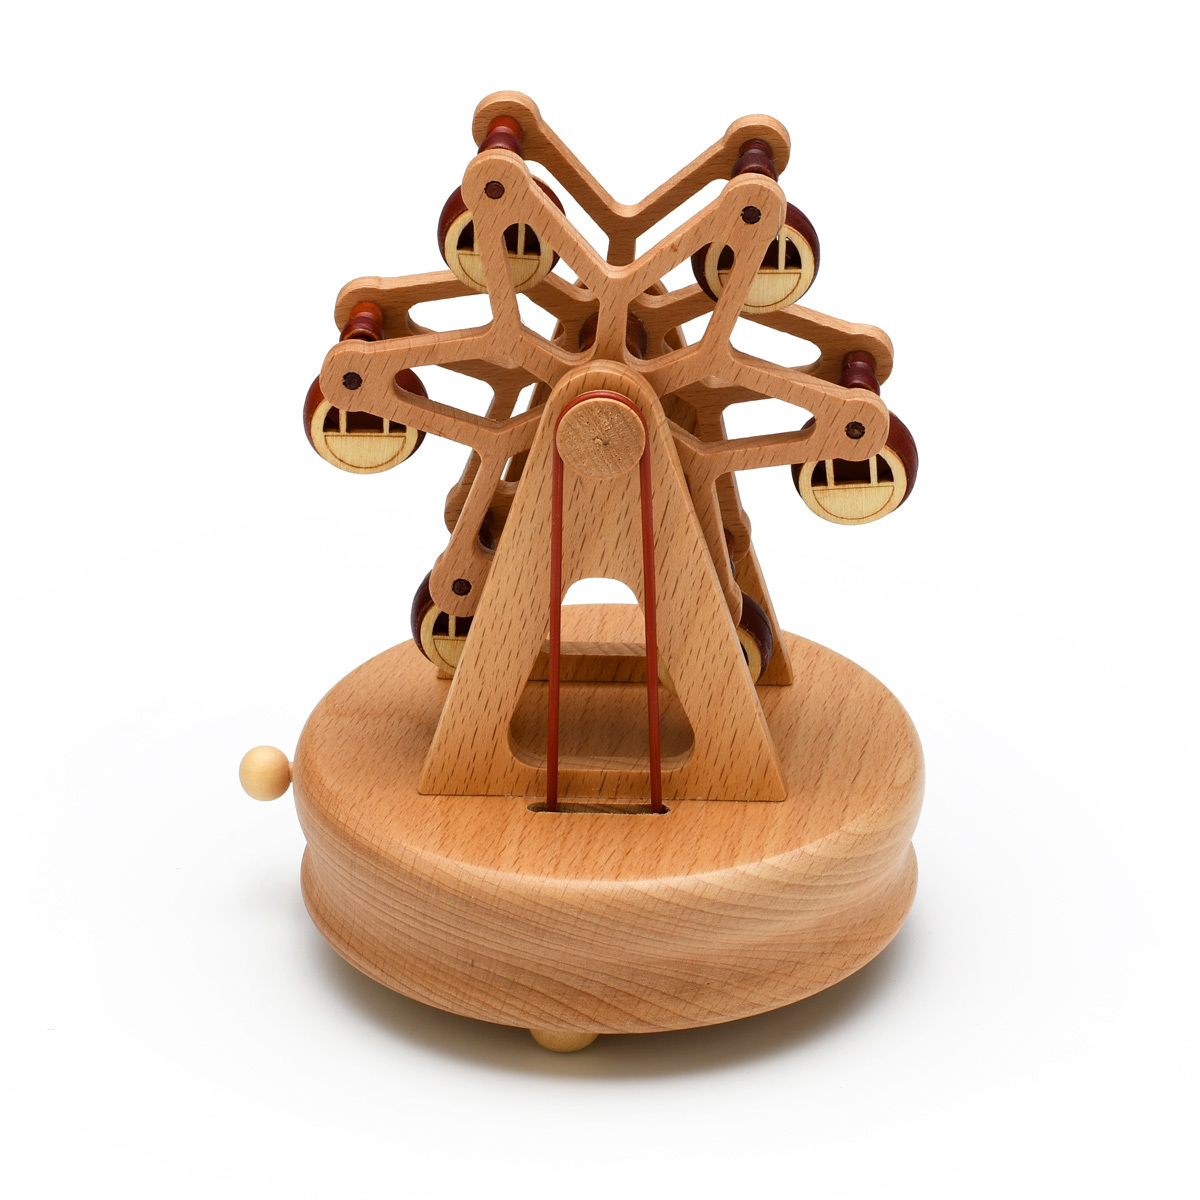 Animated 18 Note Musical Wooden Ferris-Wheel Keepsake